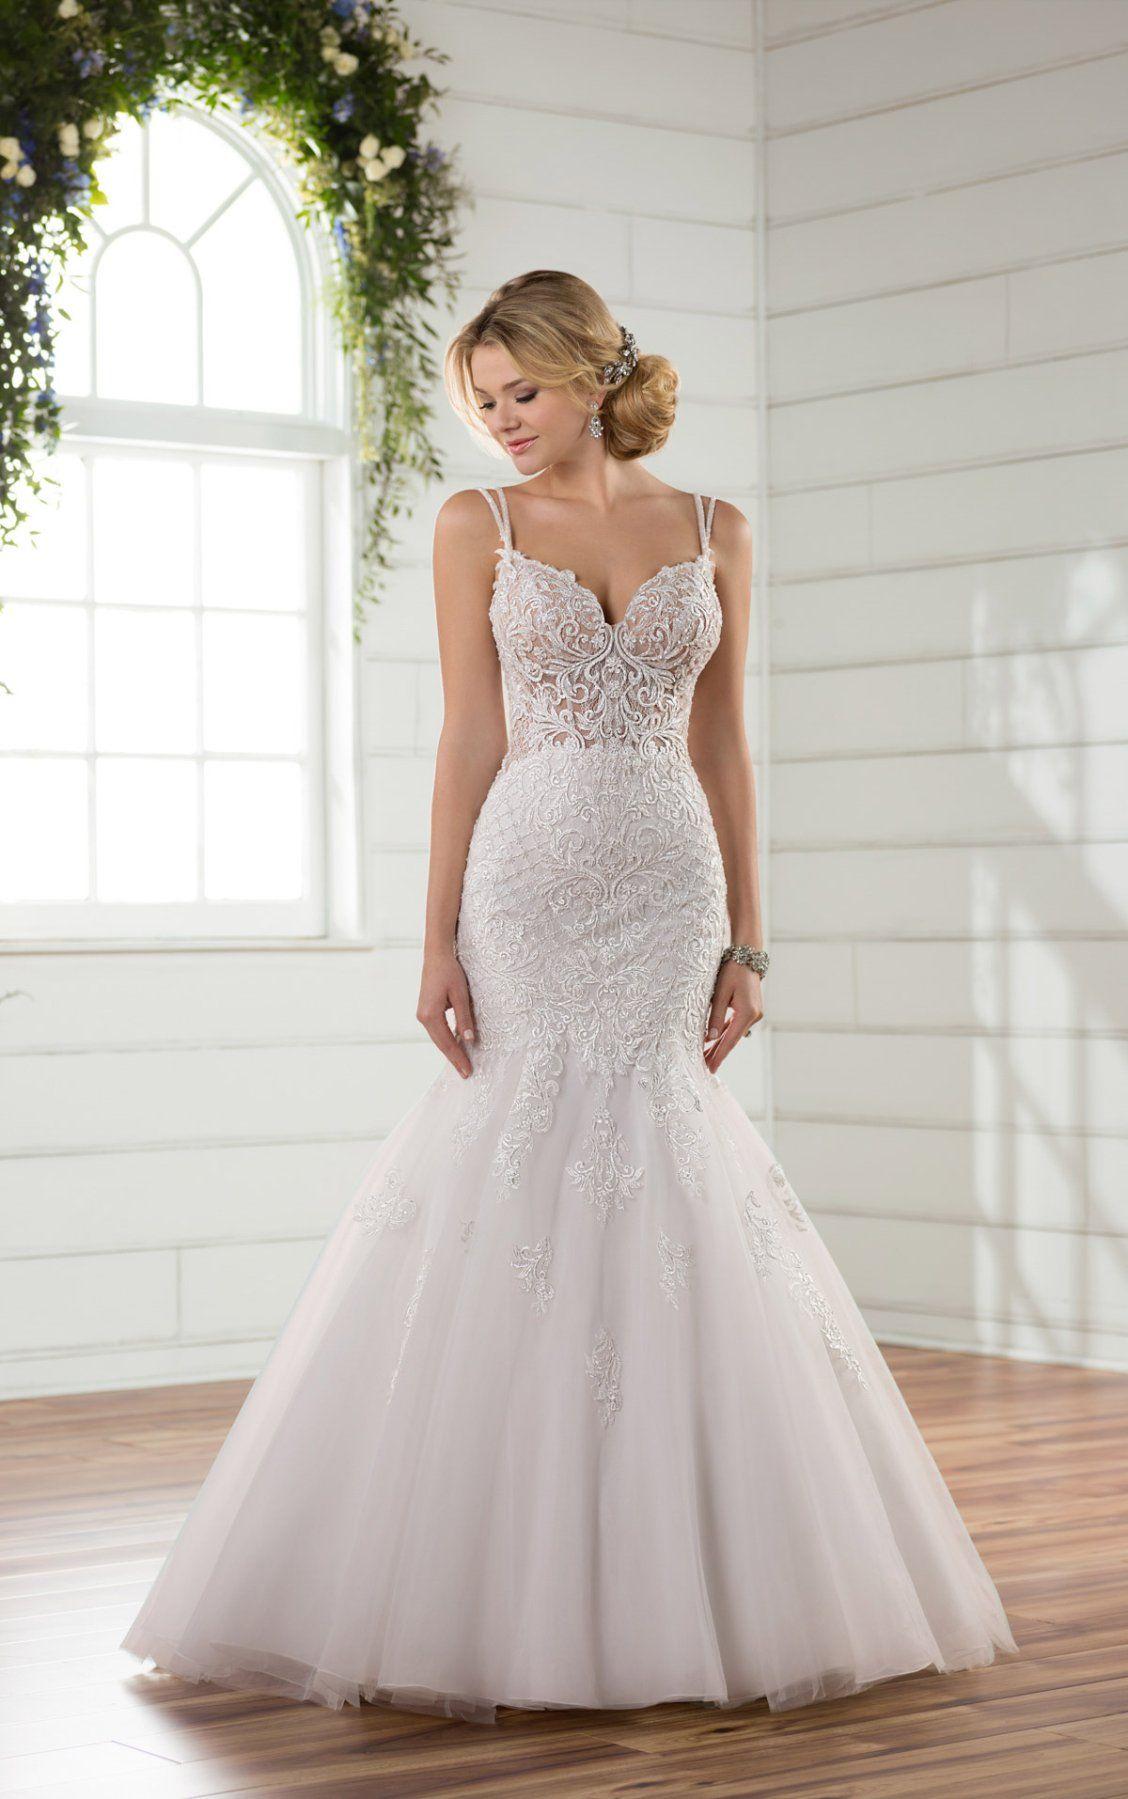 Mermaid Wedding Dresses 1 Bridal Gowns Pinterest Wedding